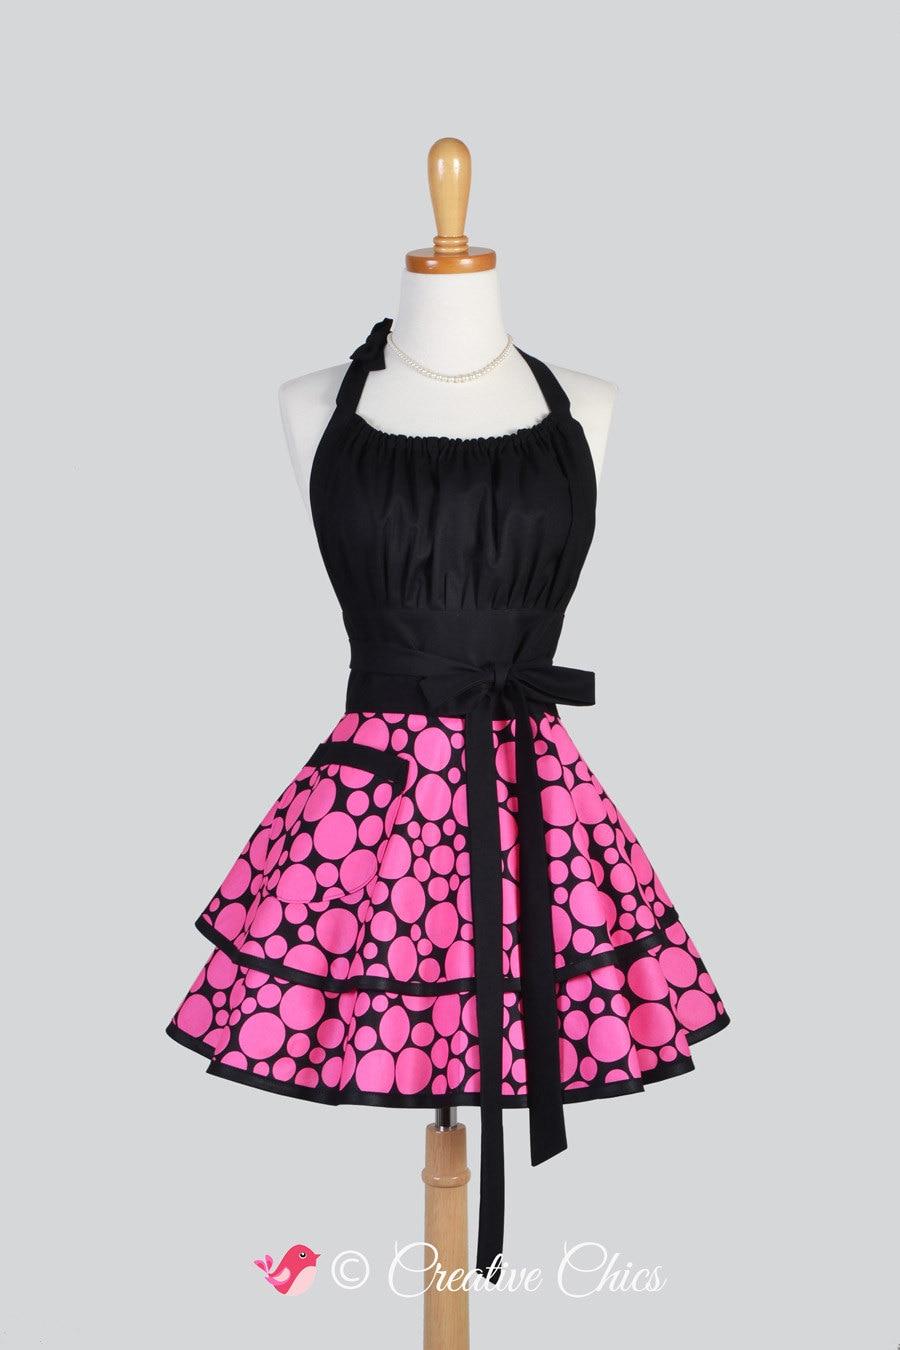 Flirty Chic Apron Hot Pink And Black Polka Dot Sexy